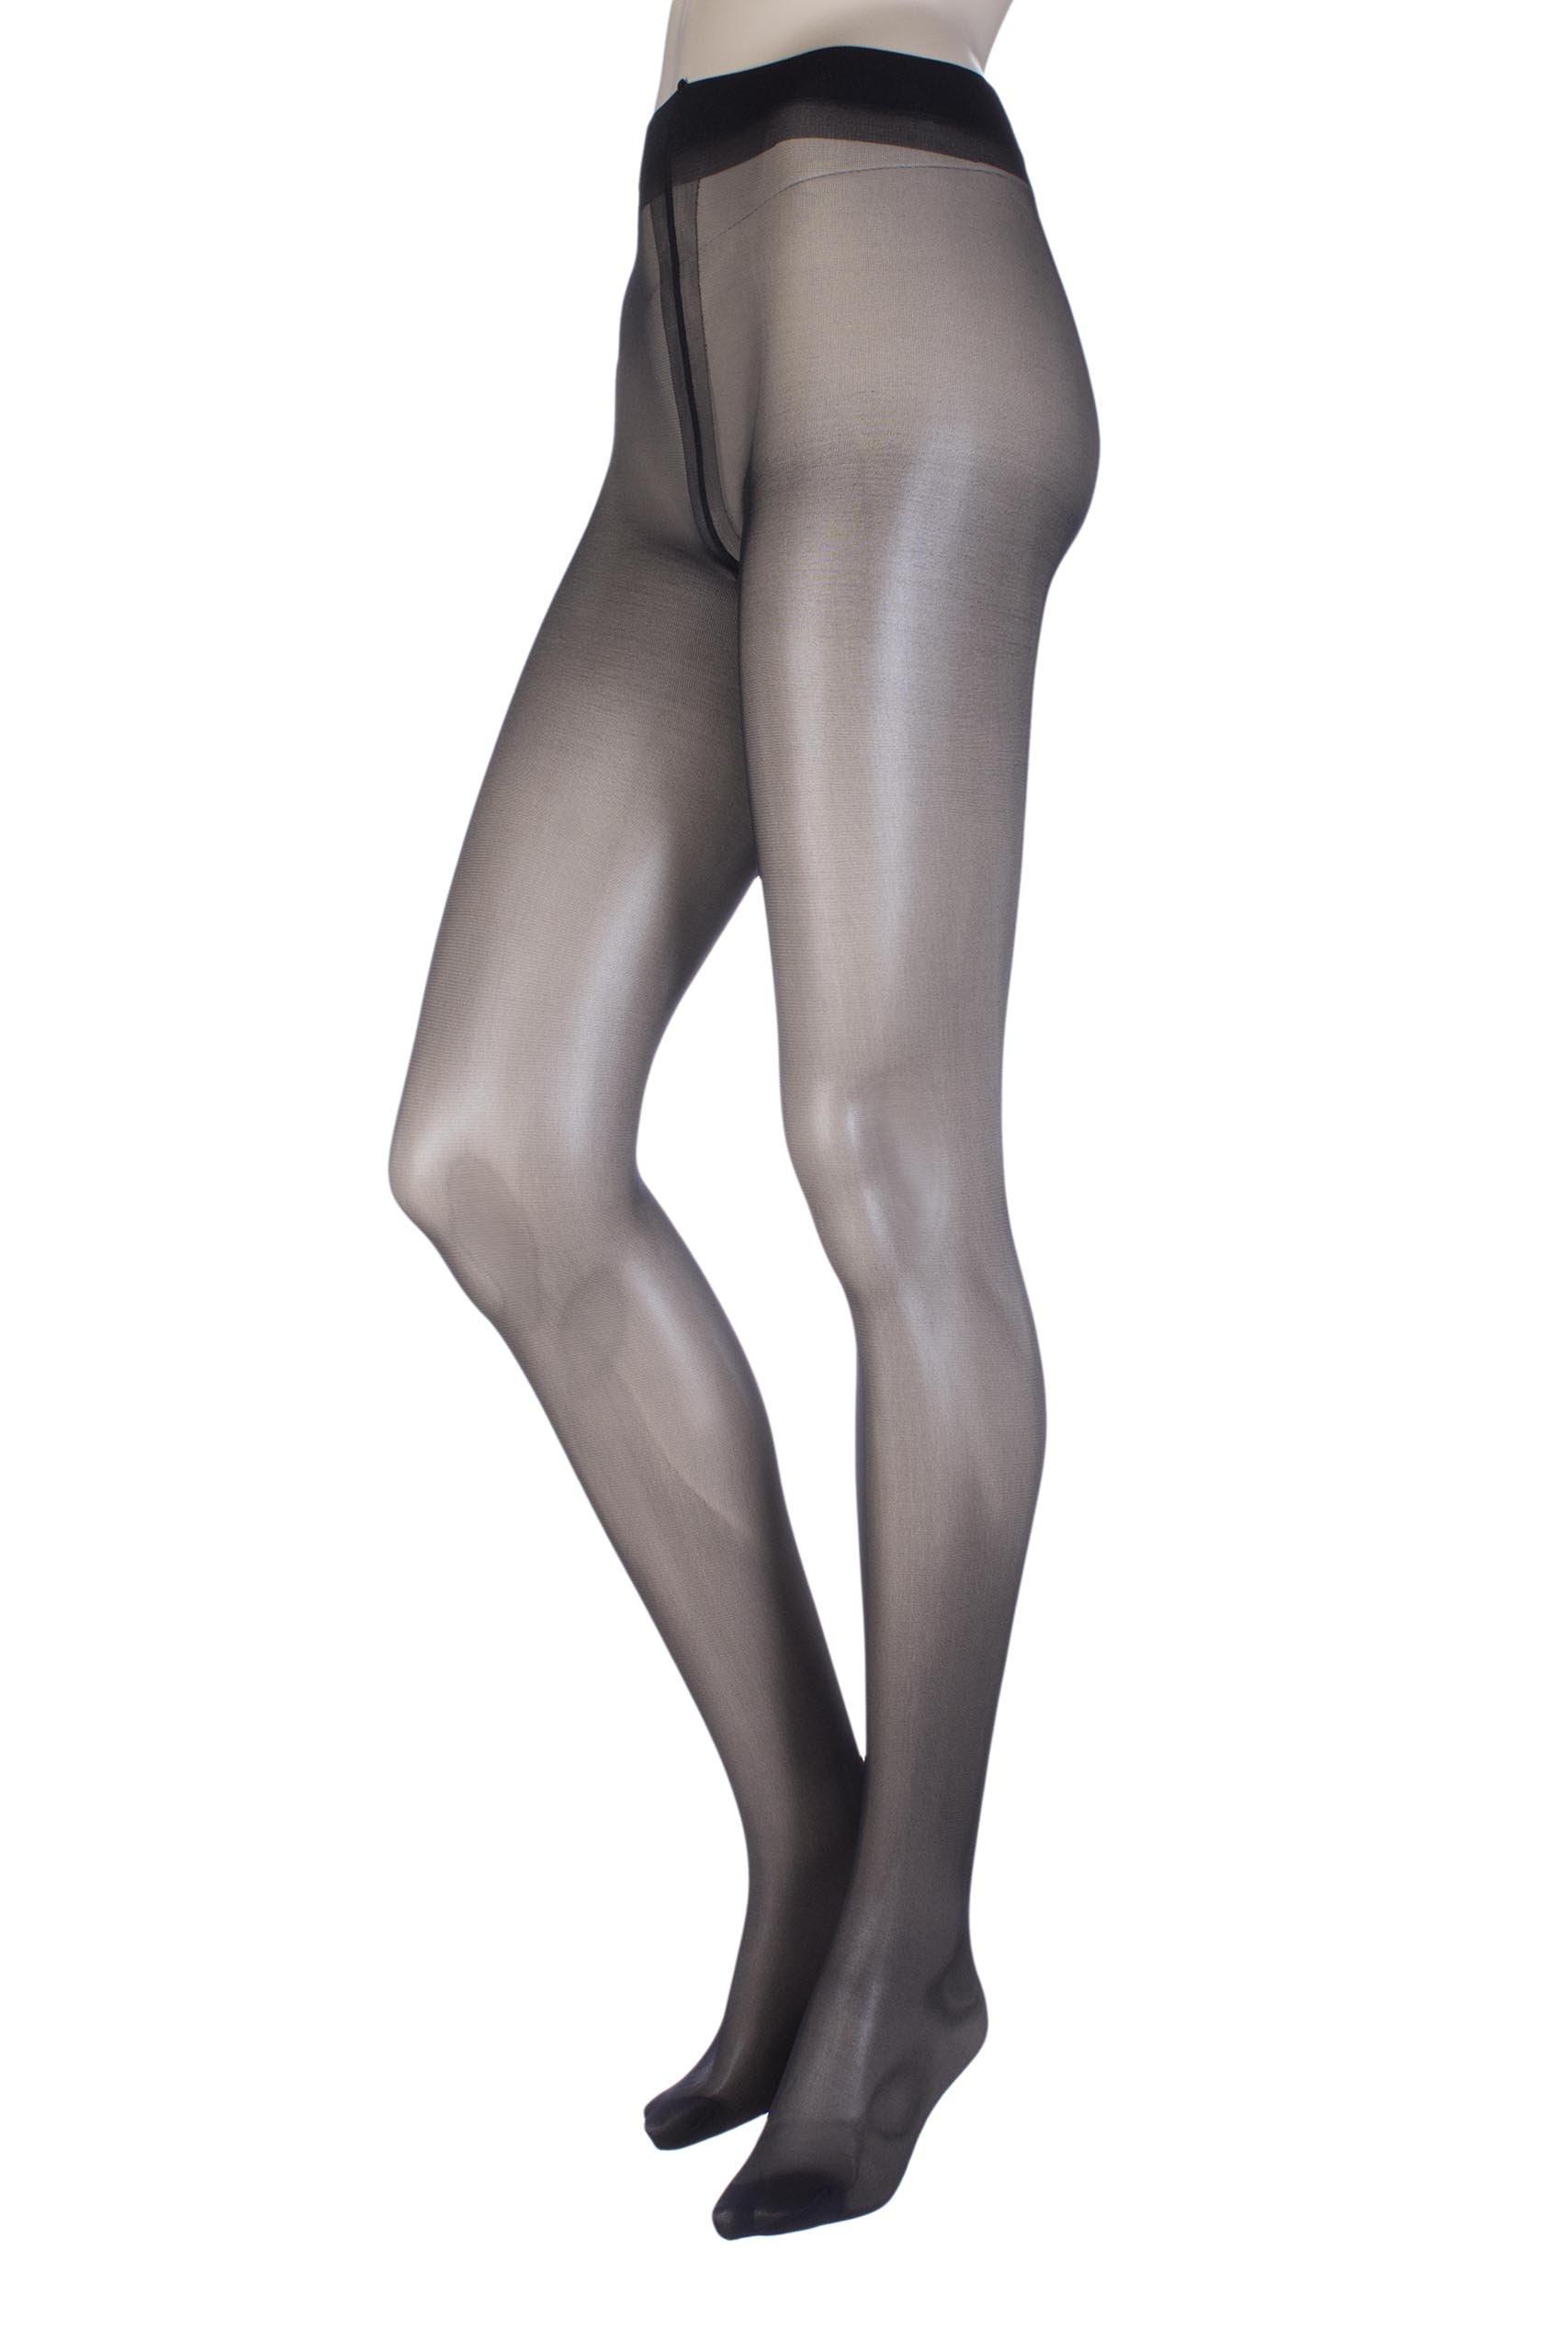 Ladies 1 Pair Oroblu Repos 70 Denier Graduated Compression Tights Black Small